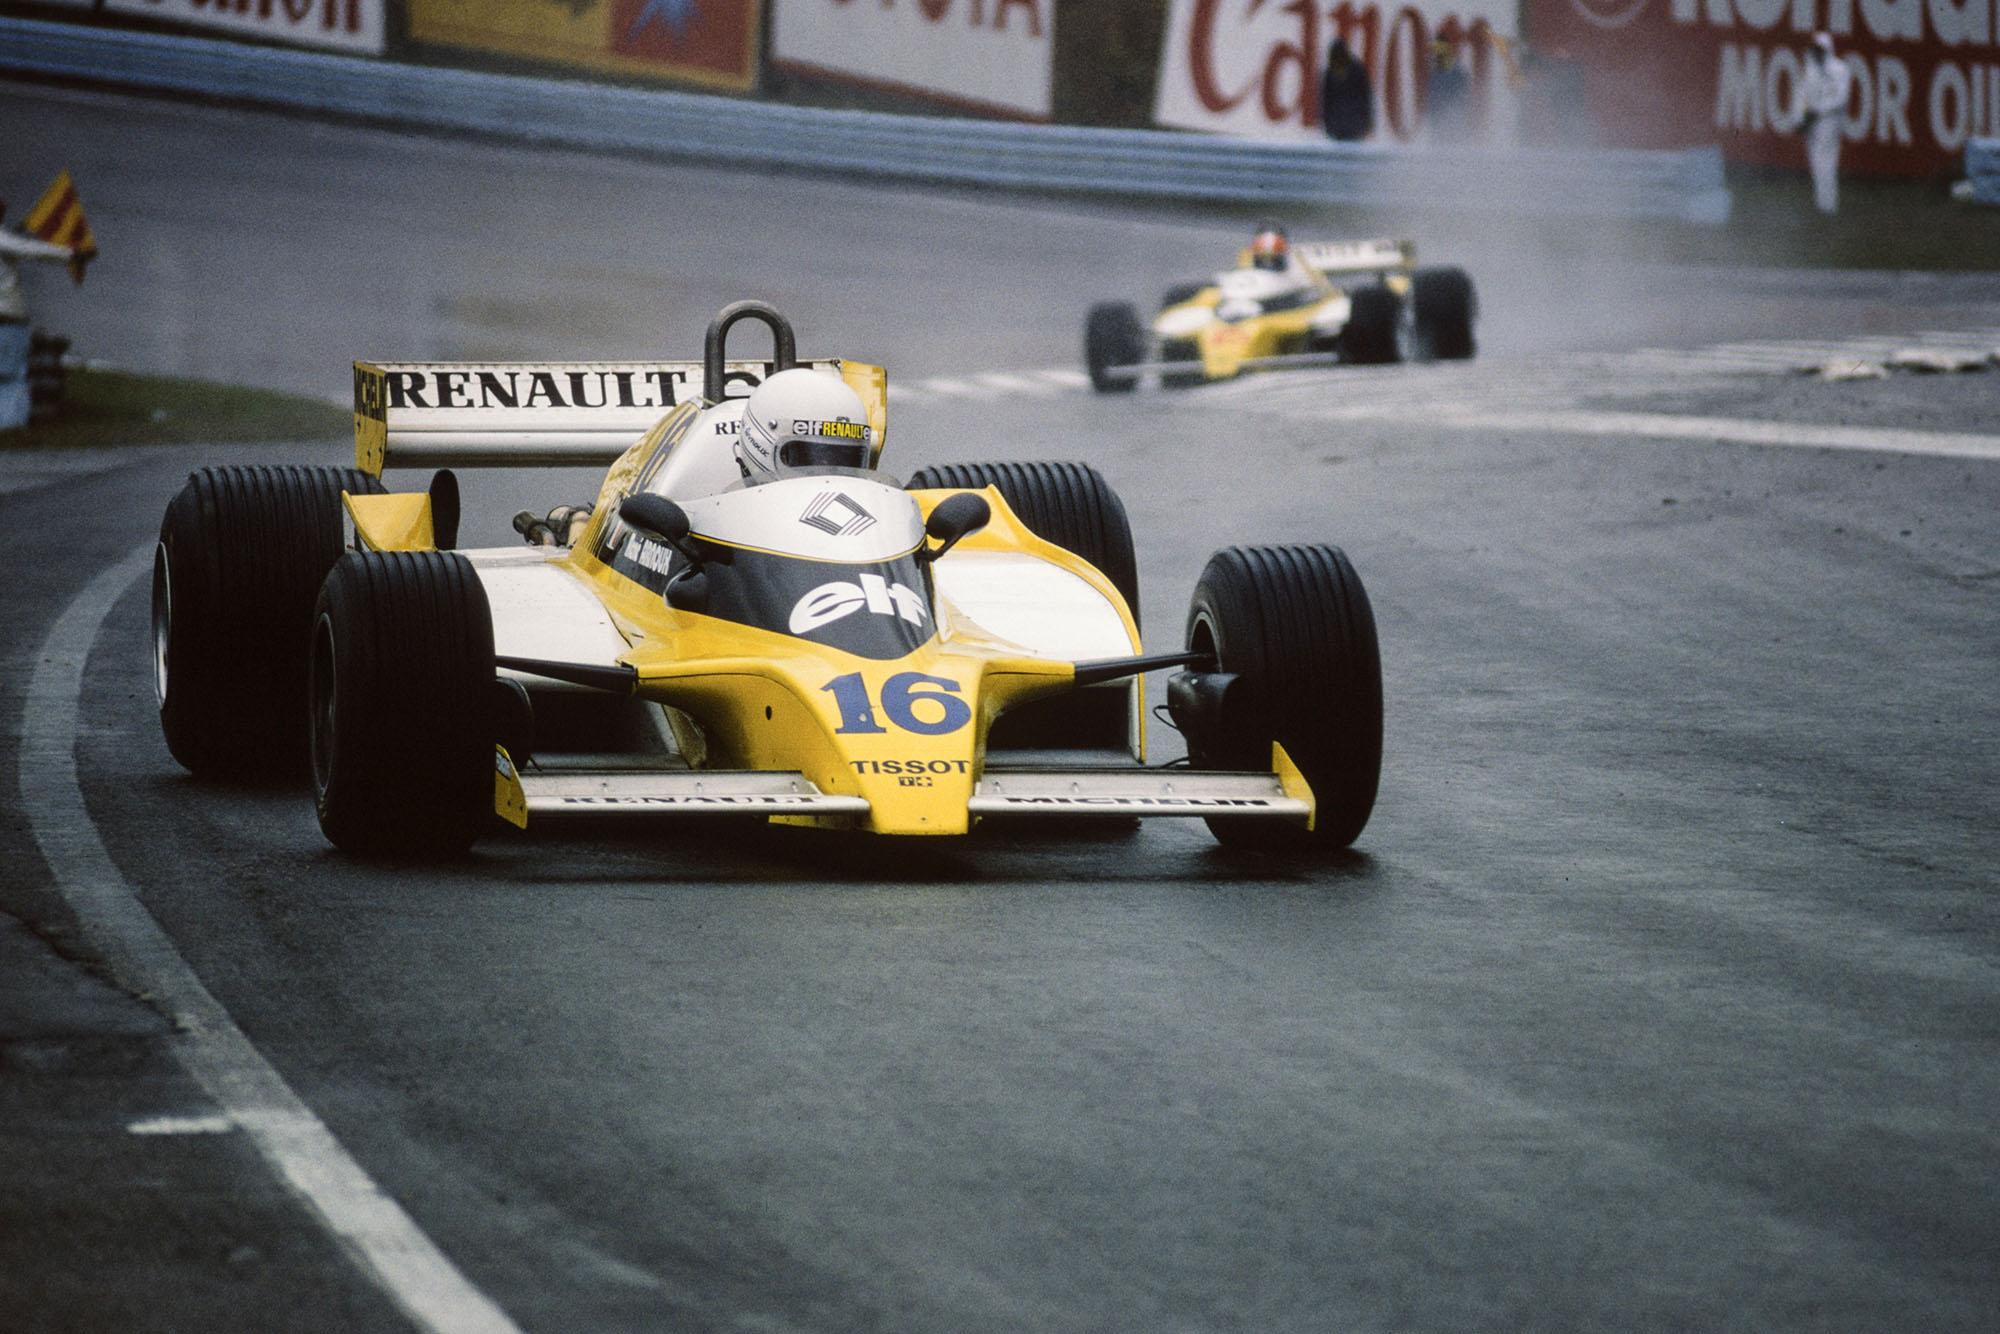 1979 US GP East Arnoux